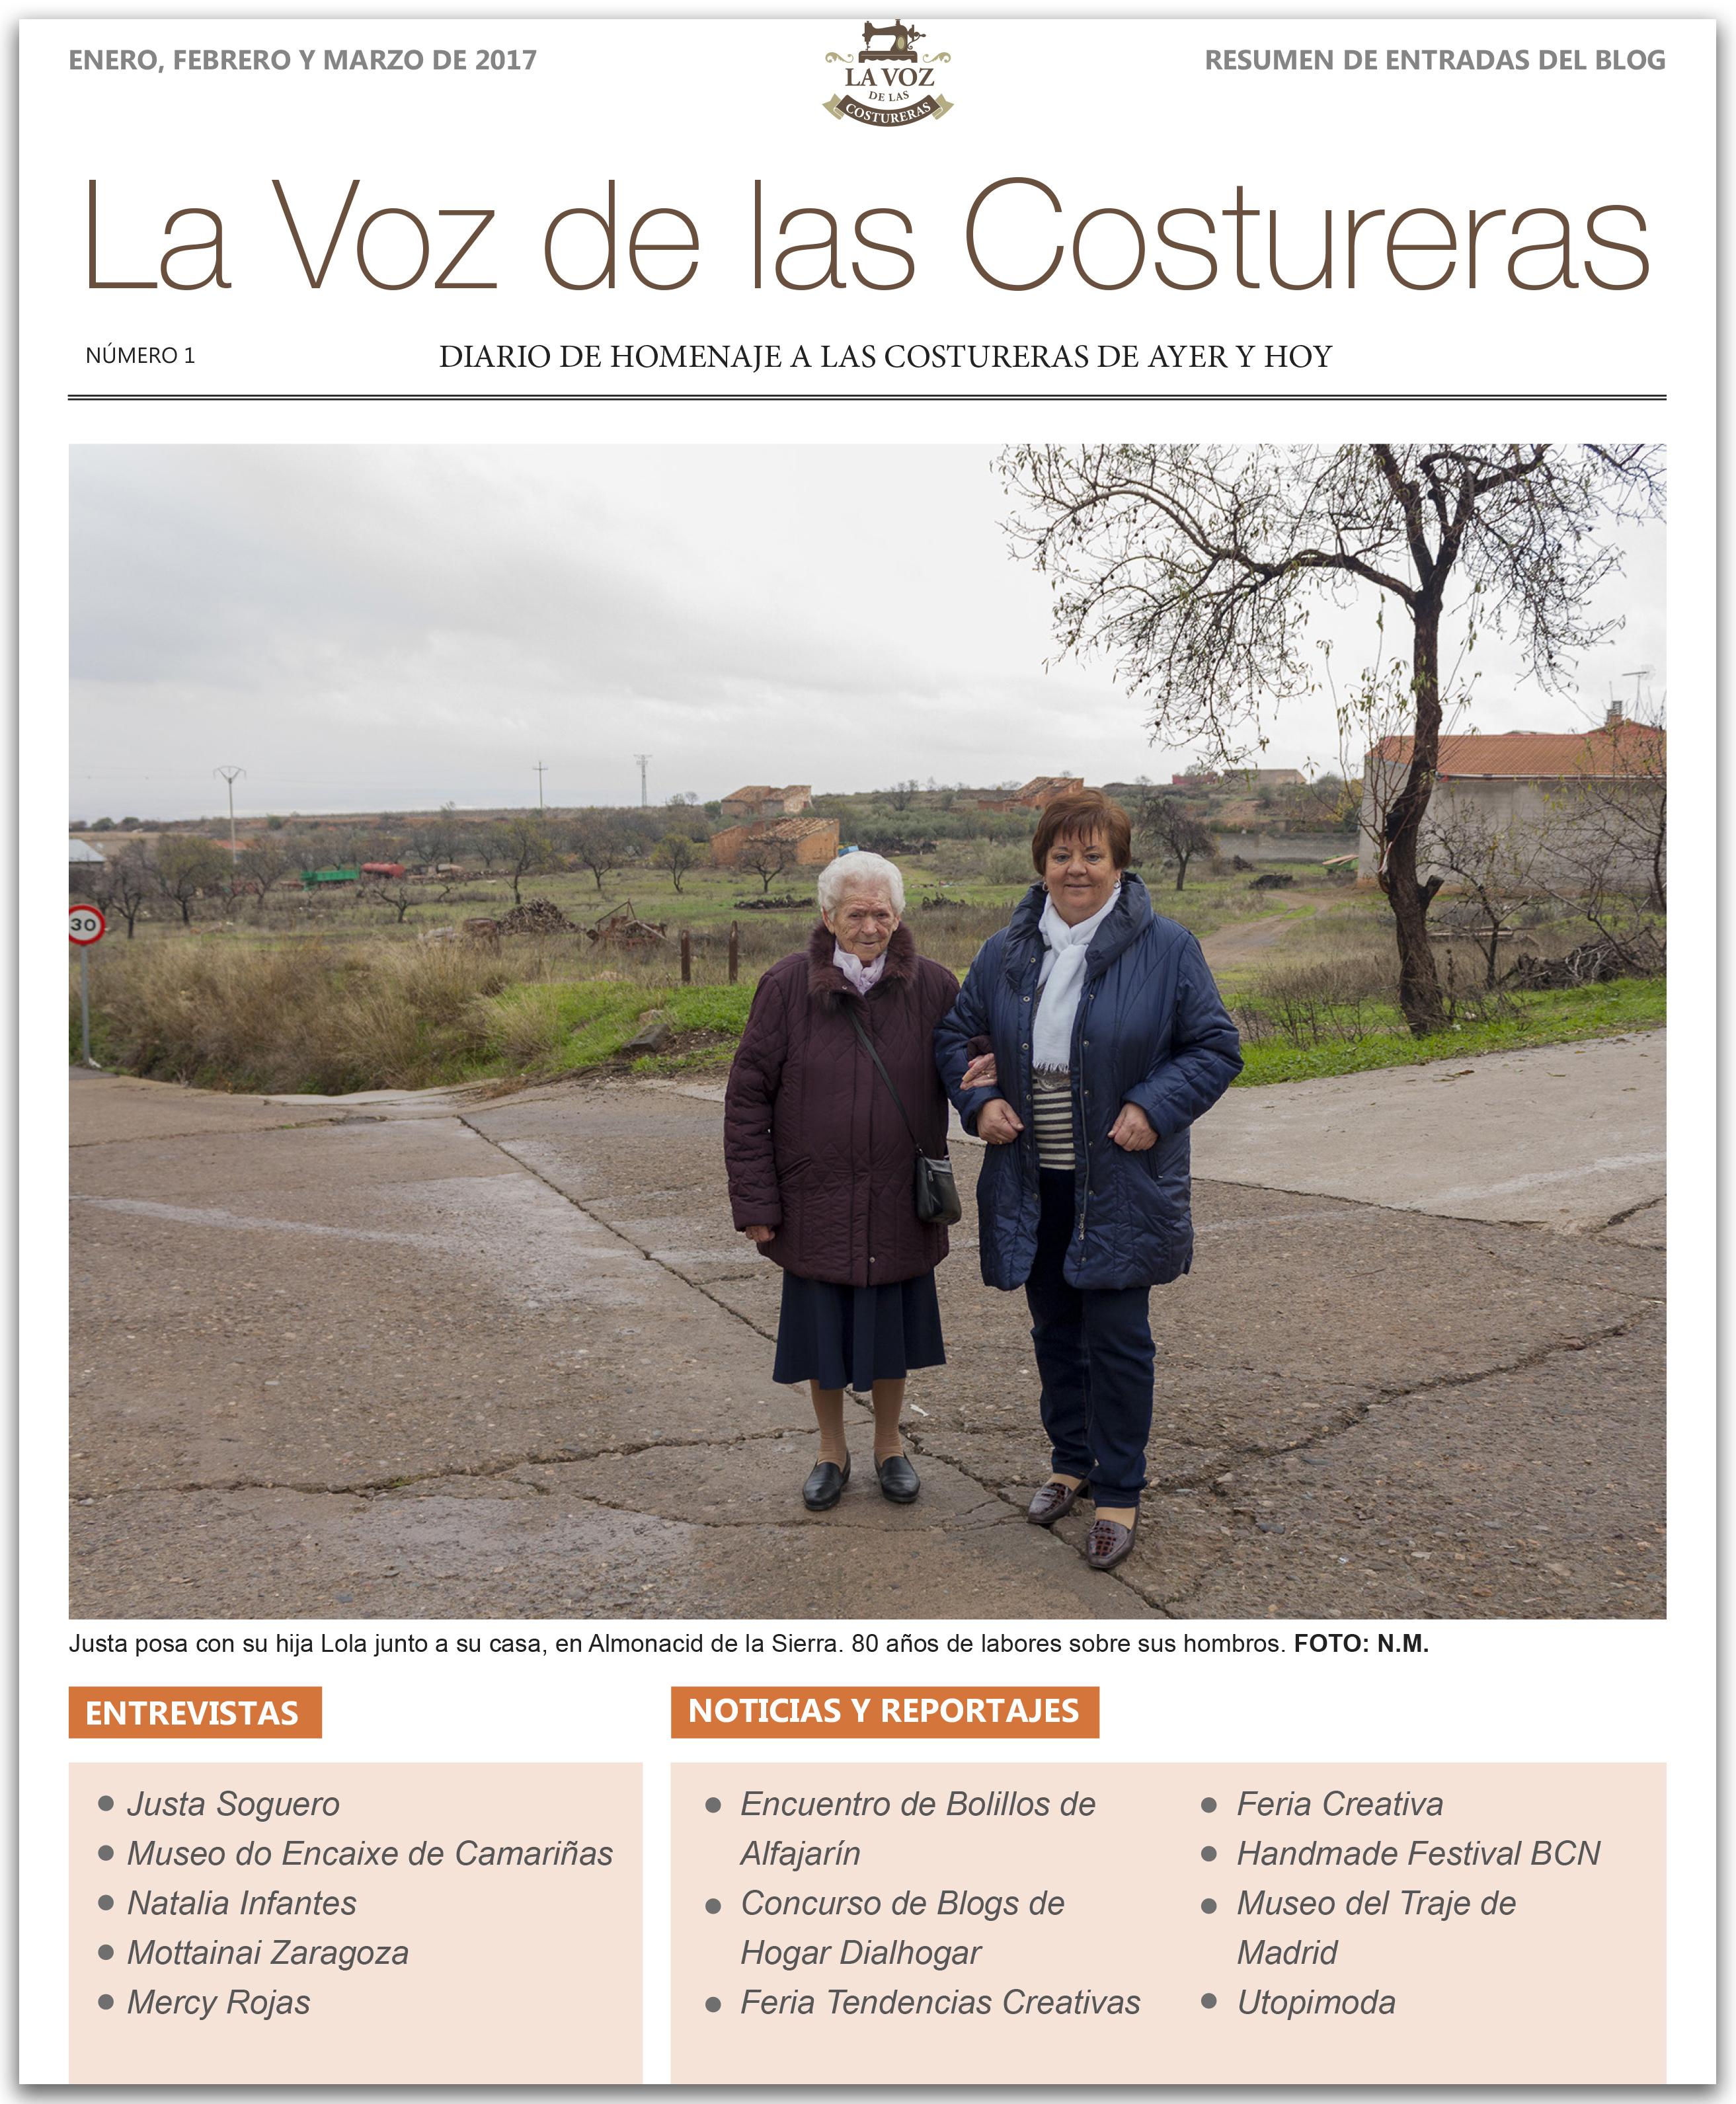 La Voz de las Costureras, resumen post 1º trimestre 2017 en www.blurb.es